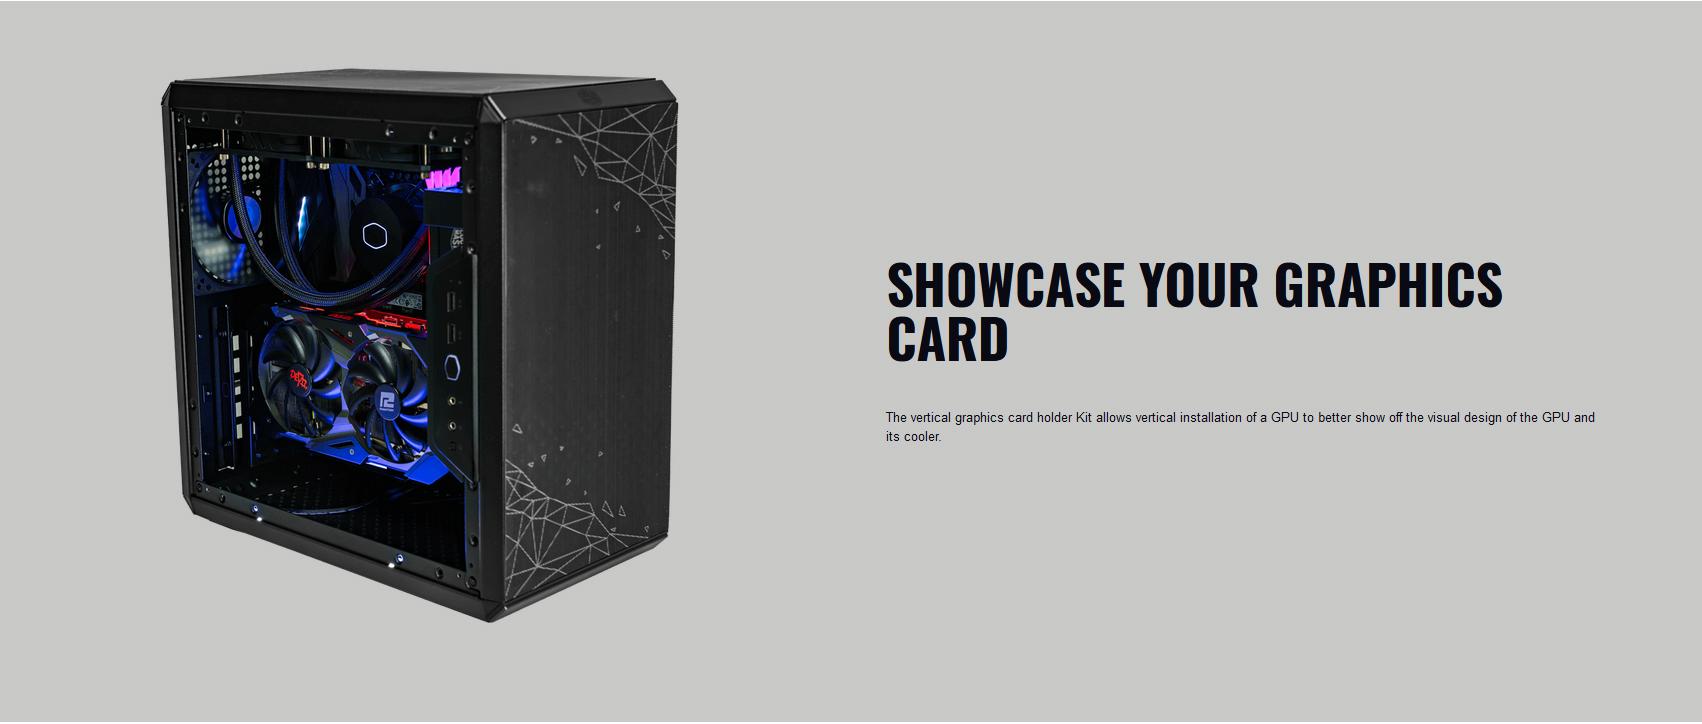 Riser Cooler Master VERTICAL GRAPHICS CARD HOLDER KIT V2 giới thiệu 2